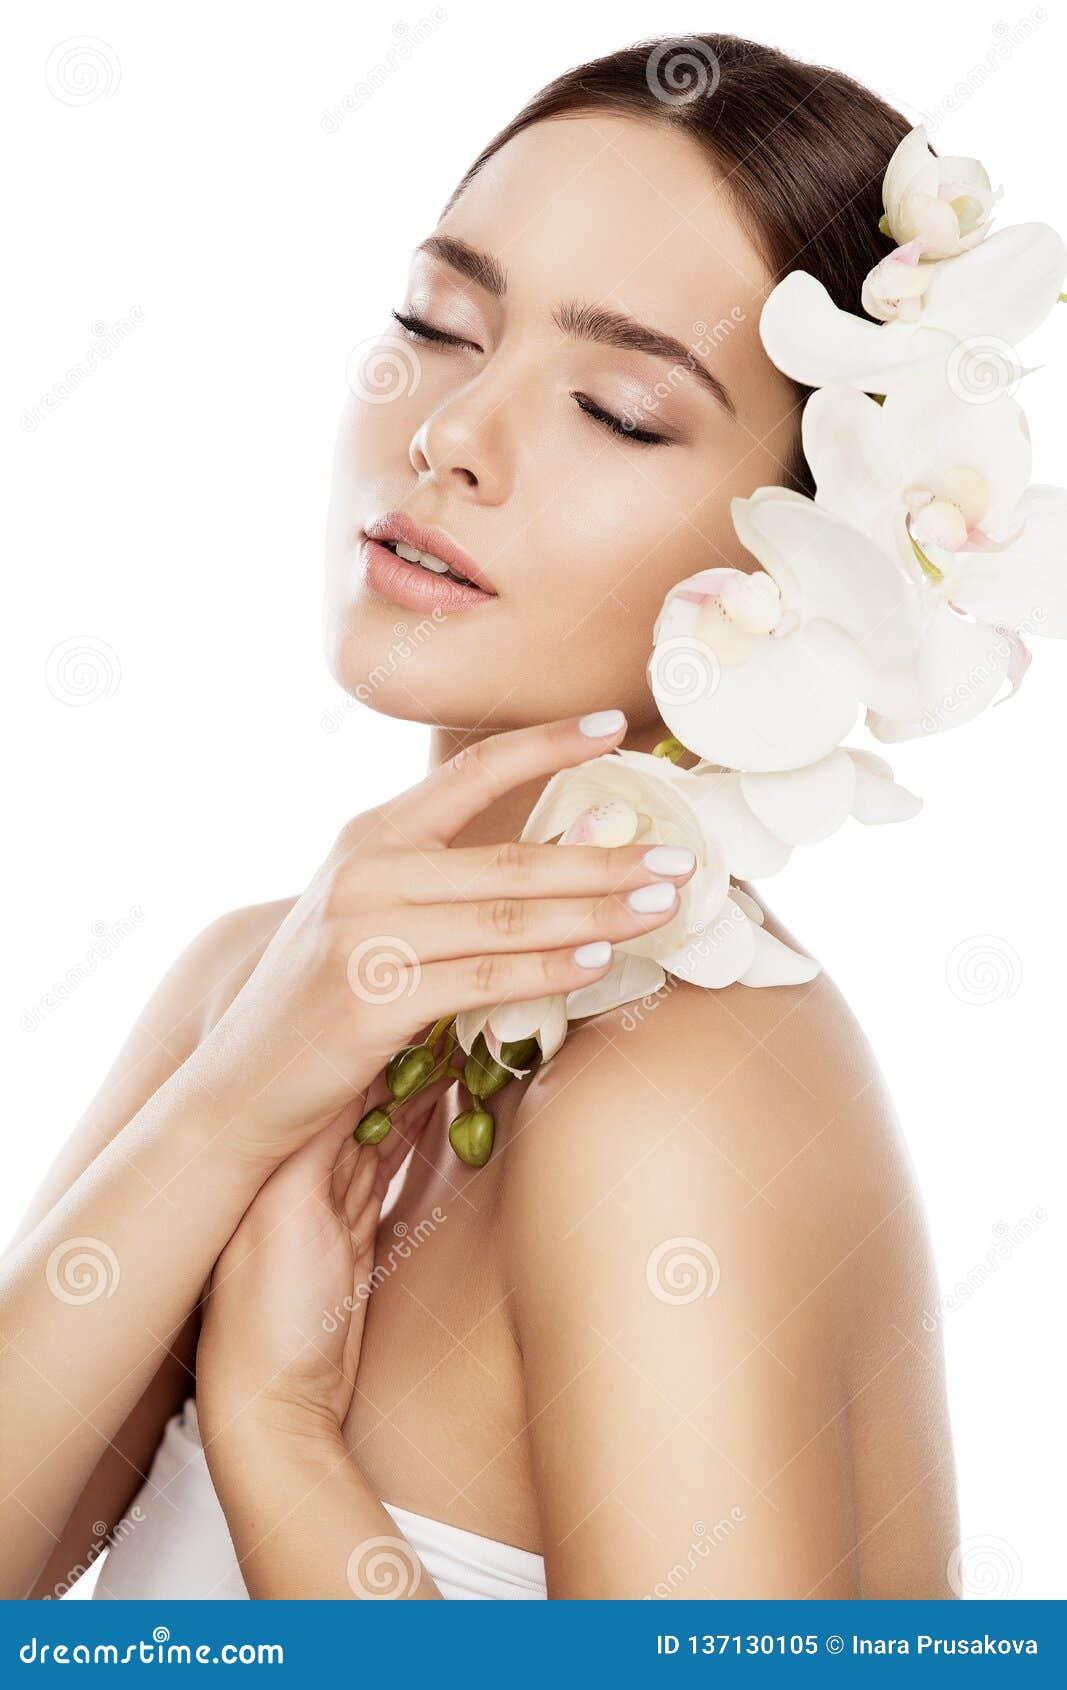 Beauty Spa φροντίδα δέρματος, πρόσωπο φυσικό Makeup γυναικών και λουλούδι ορχιδεών, πρότυπο μόδας